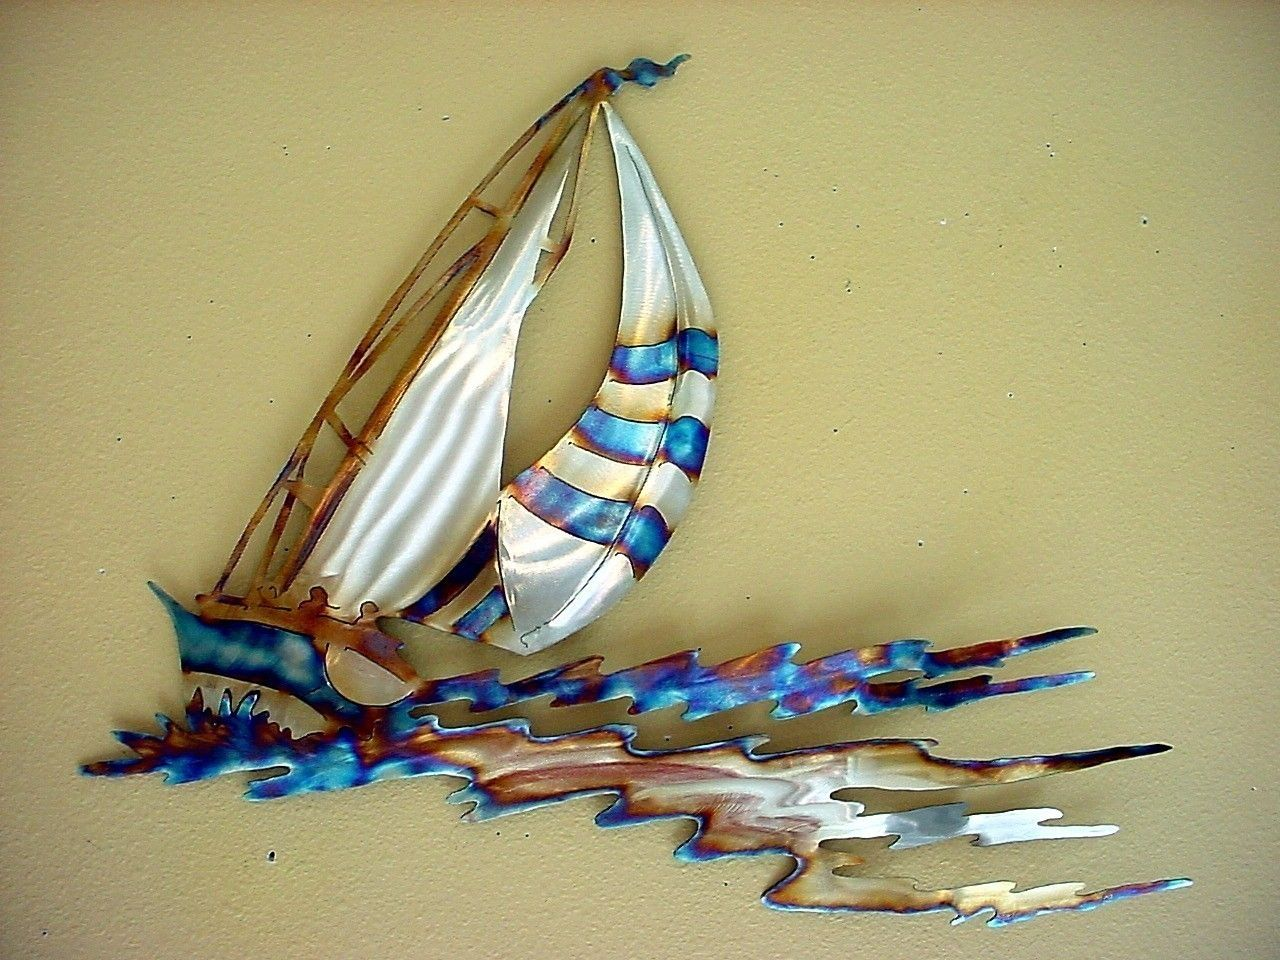 Sailboat Wall Art sailboat racing sailor sailing stainless steel metal wall art open